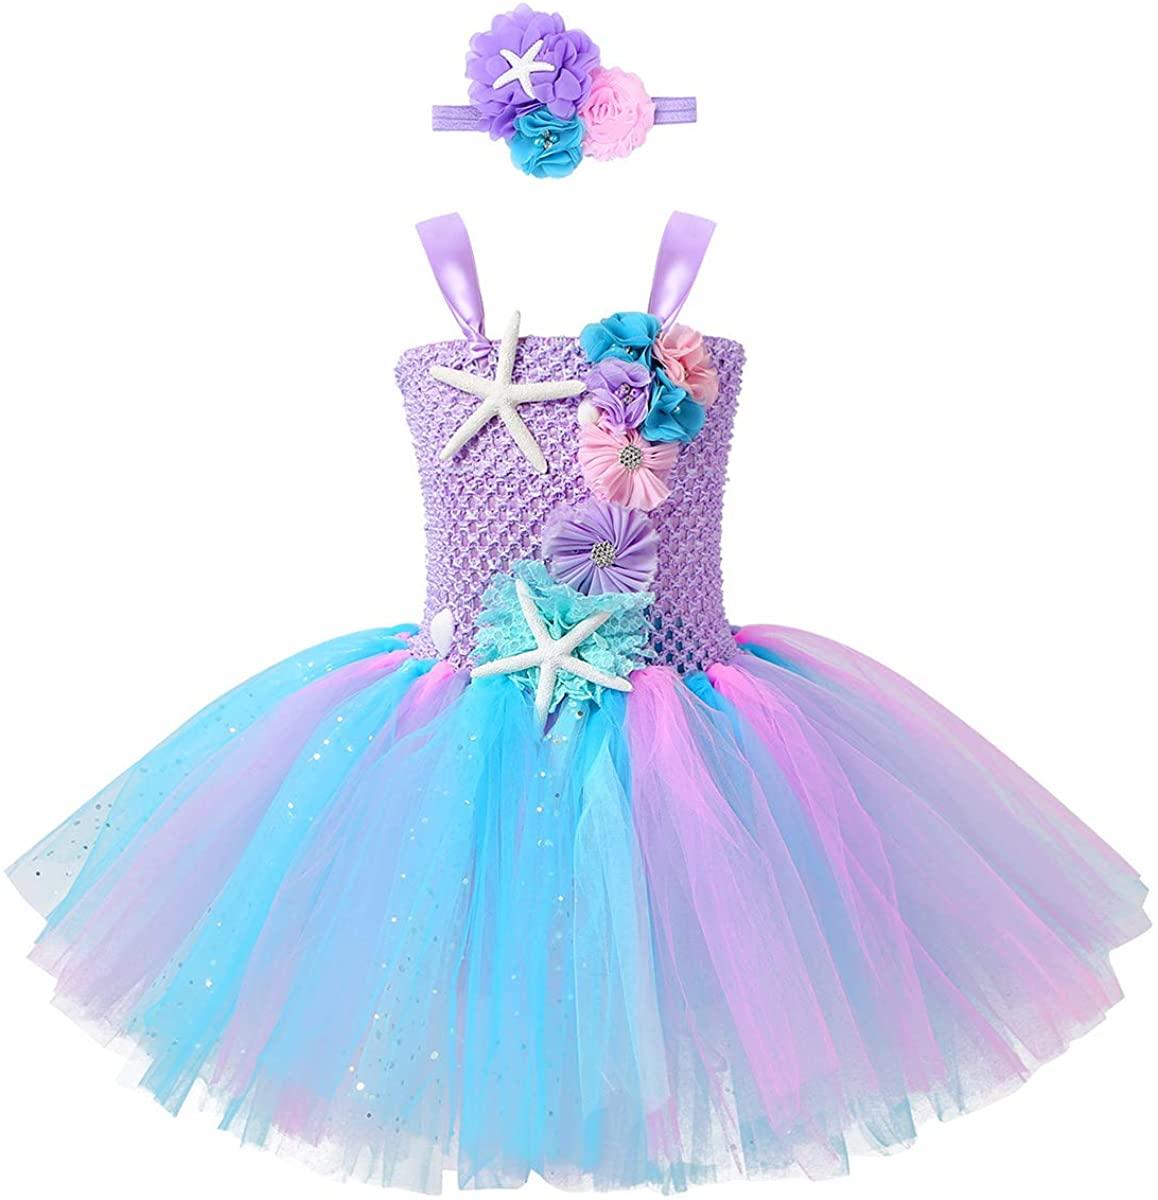 Agoky Kids Girls Halloween Clown Costume Party Dance Dress Role Play for Carnival Christmas Mardi Gras Fancy Dress